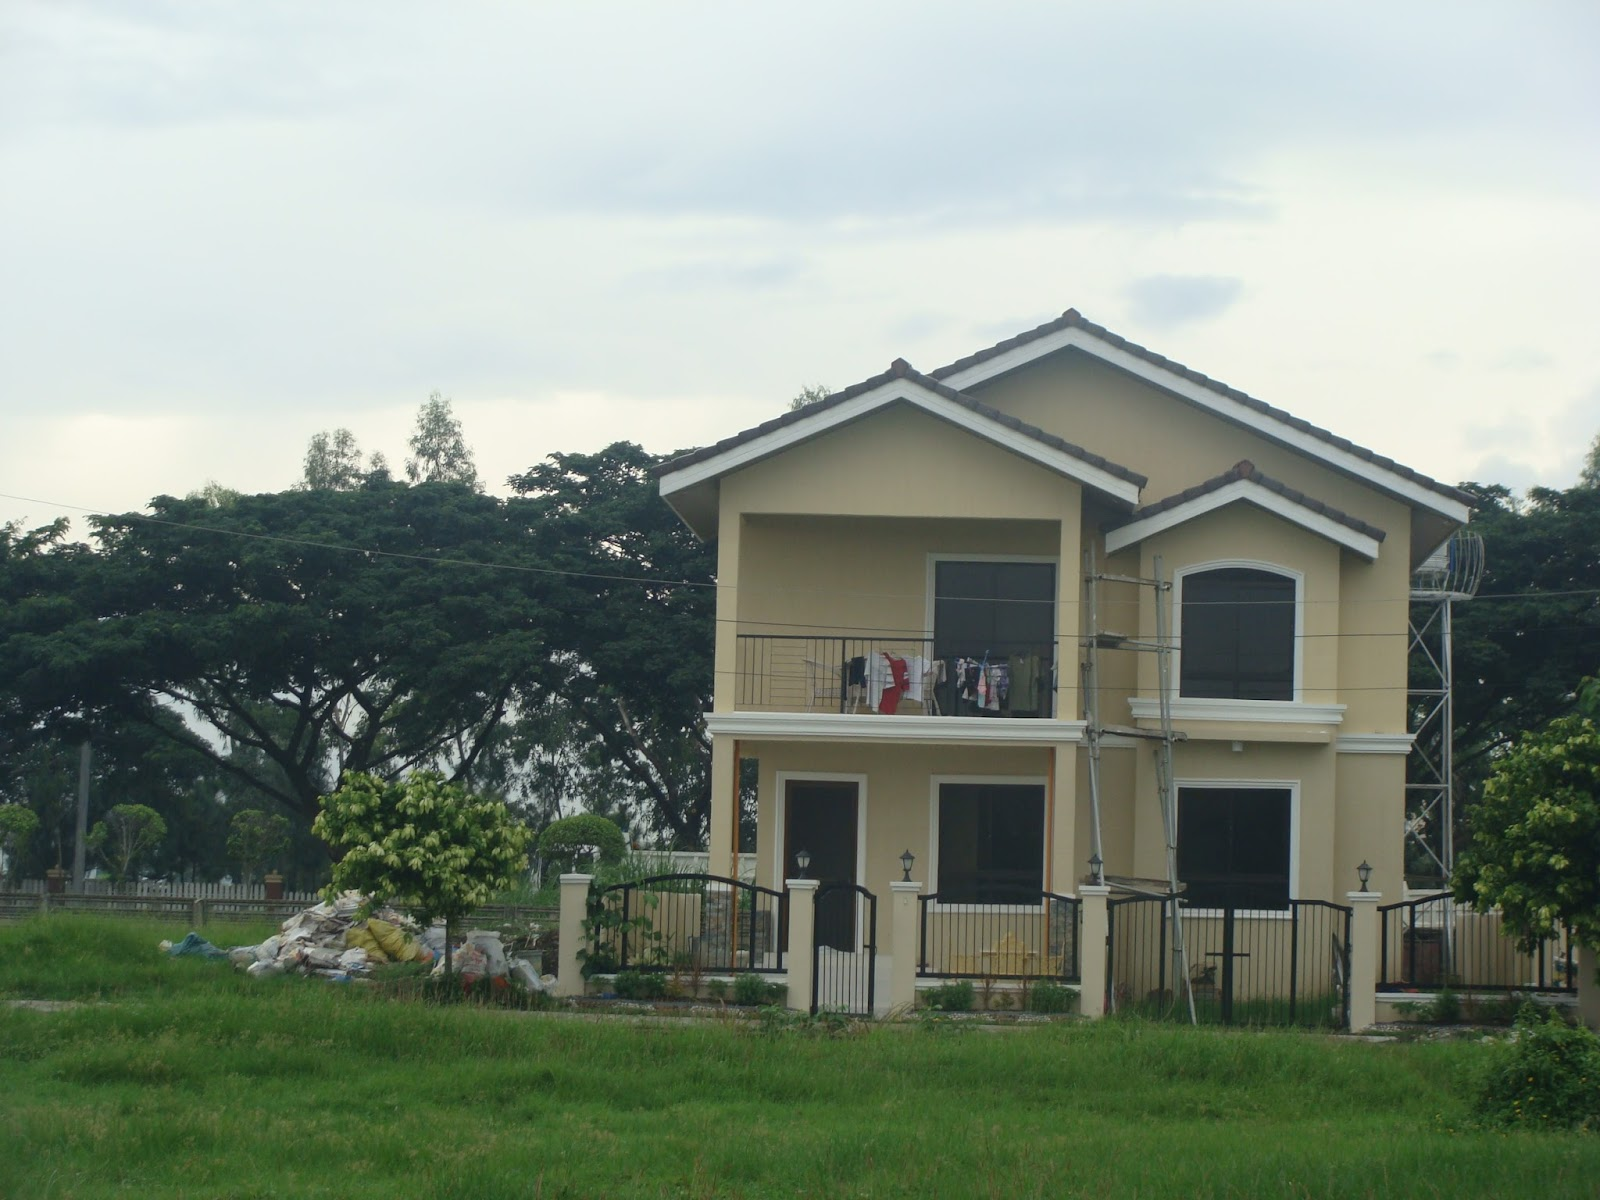 3 story apartment design philippines. Black Bedroom Furniture Sets. Home Design Ideas